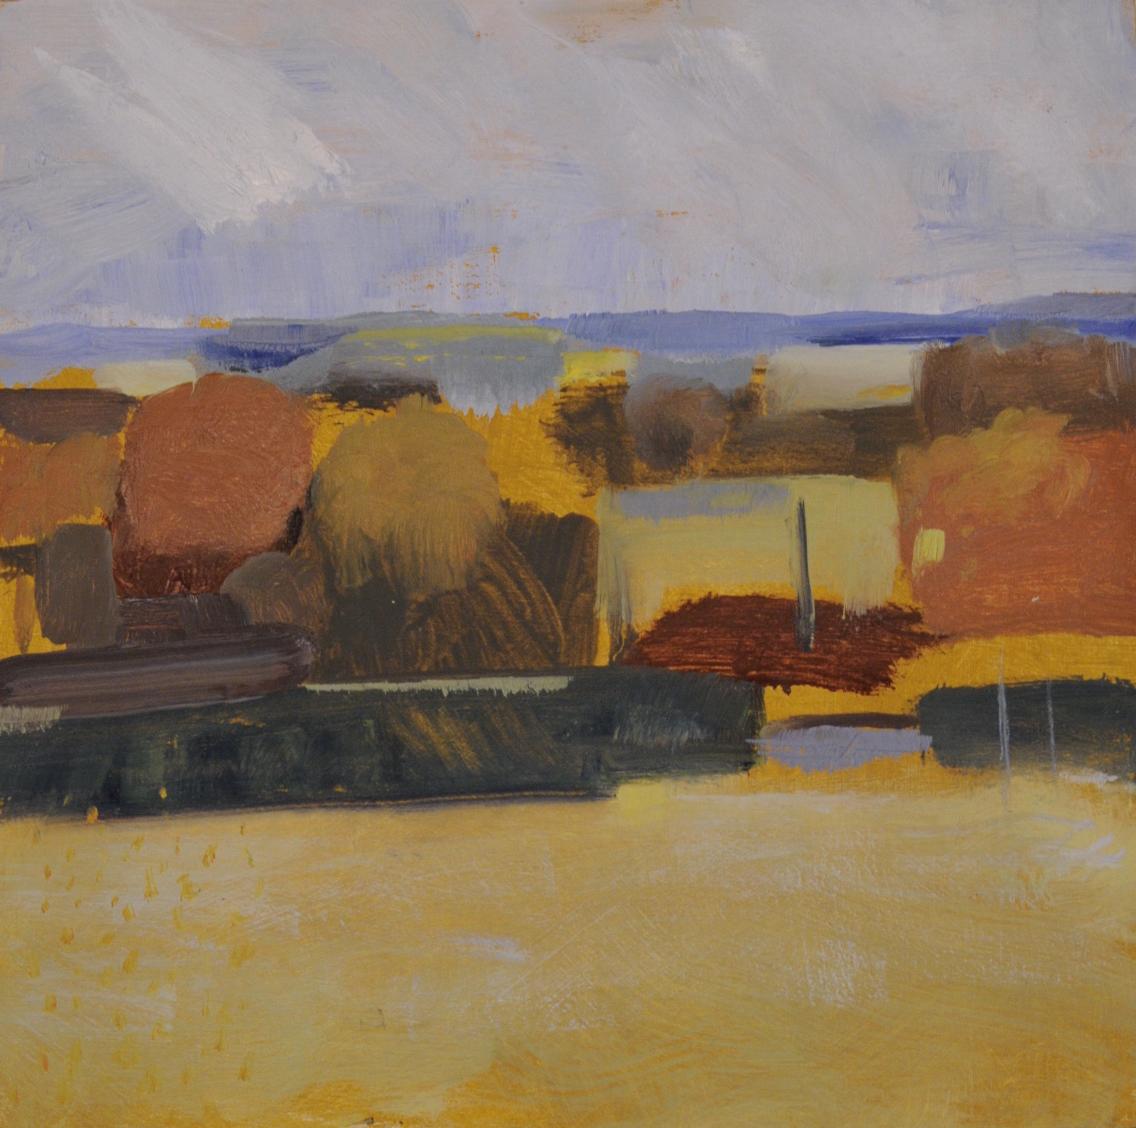 Structured landscape